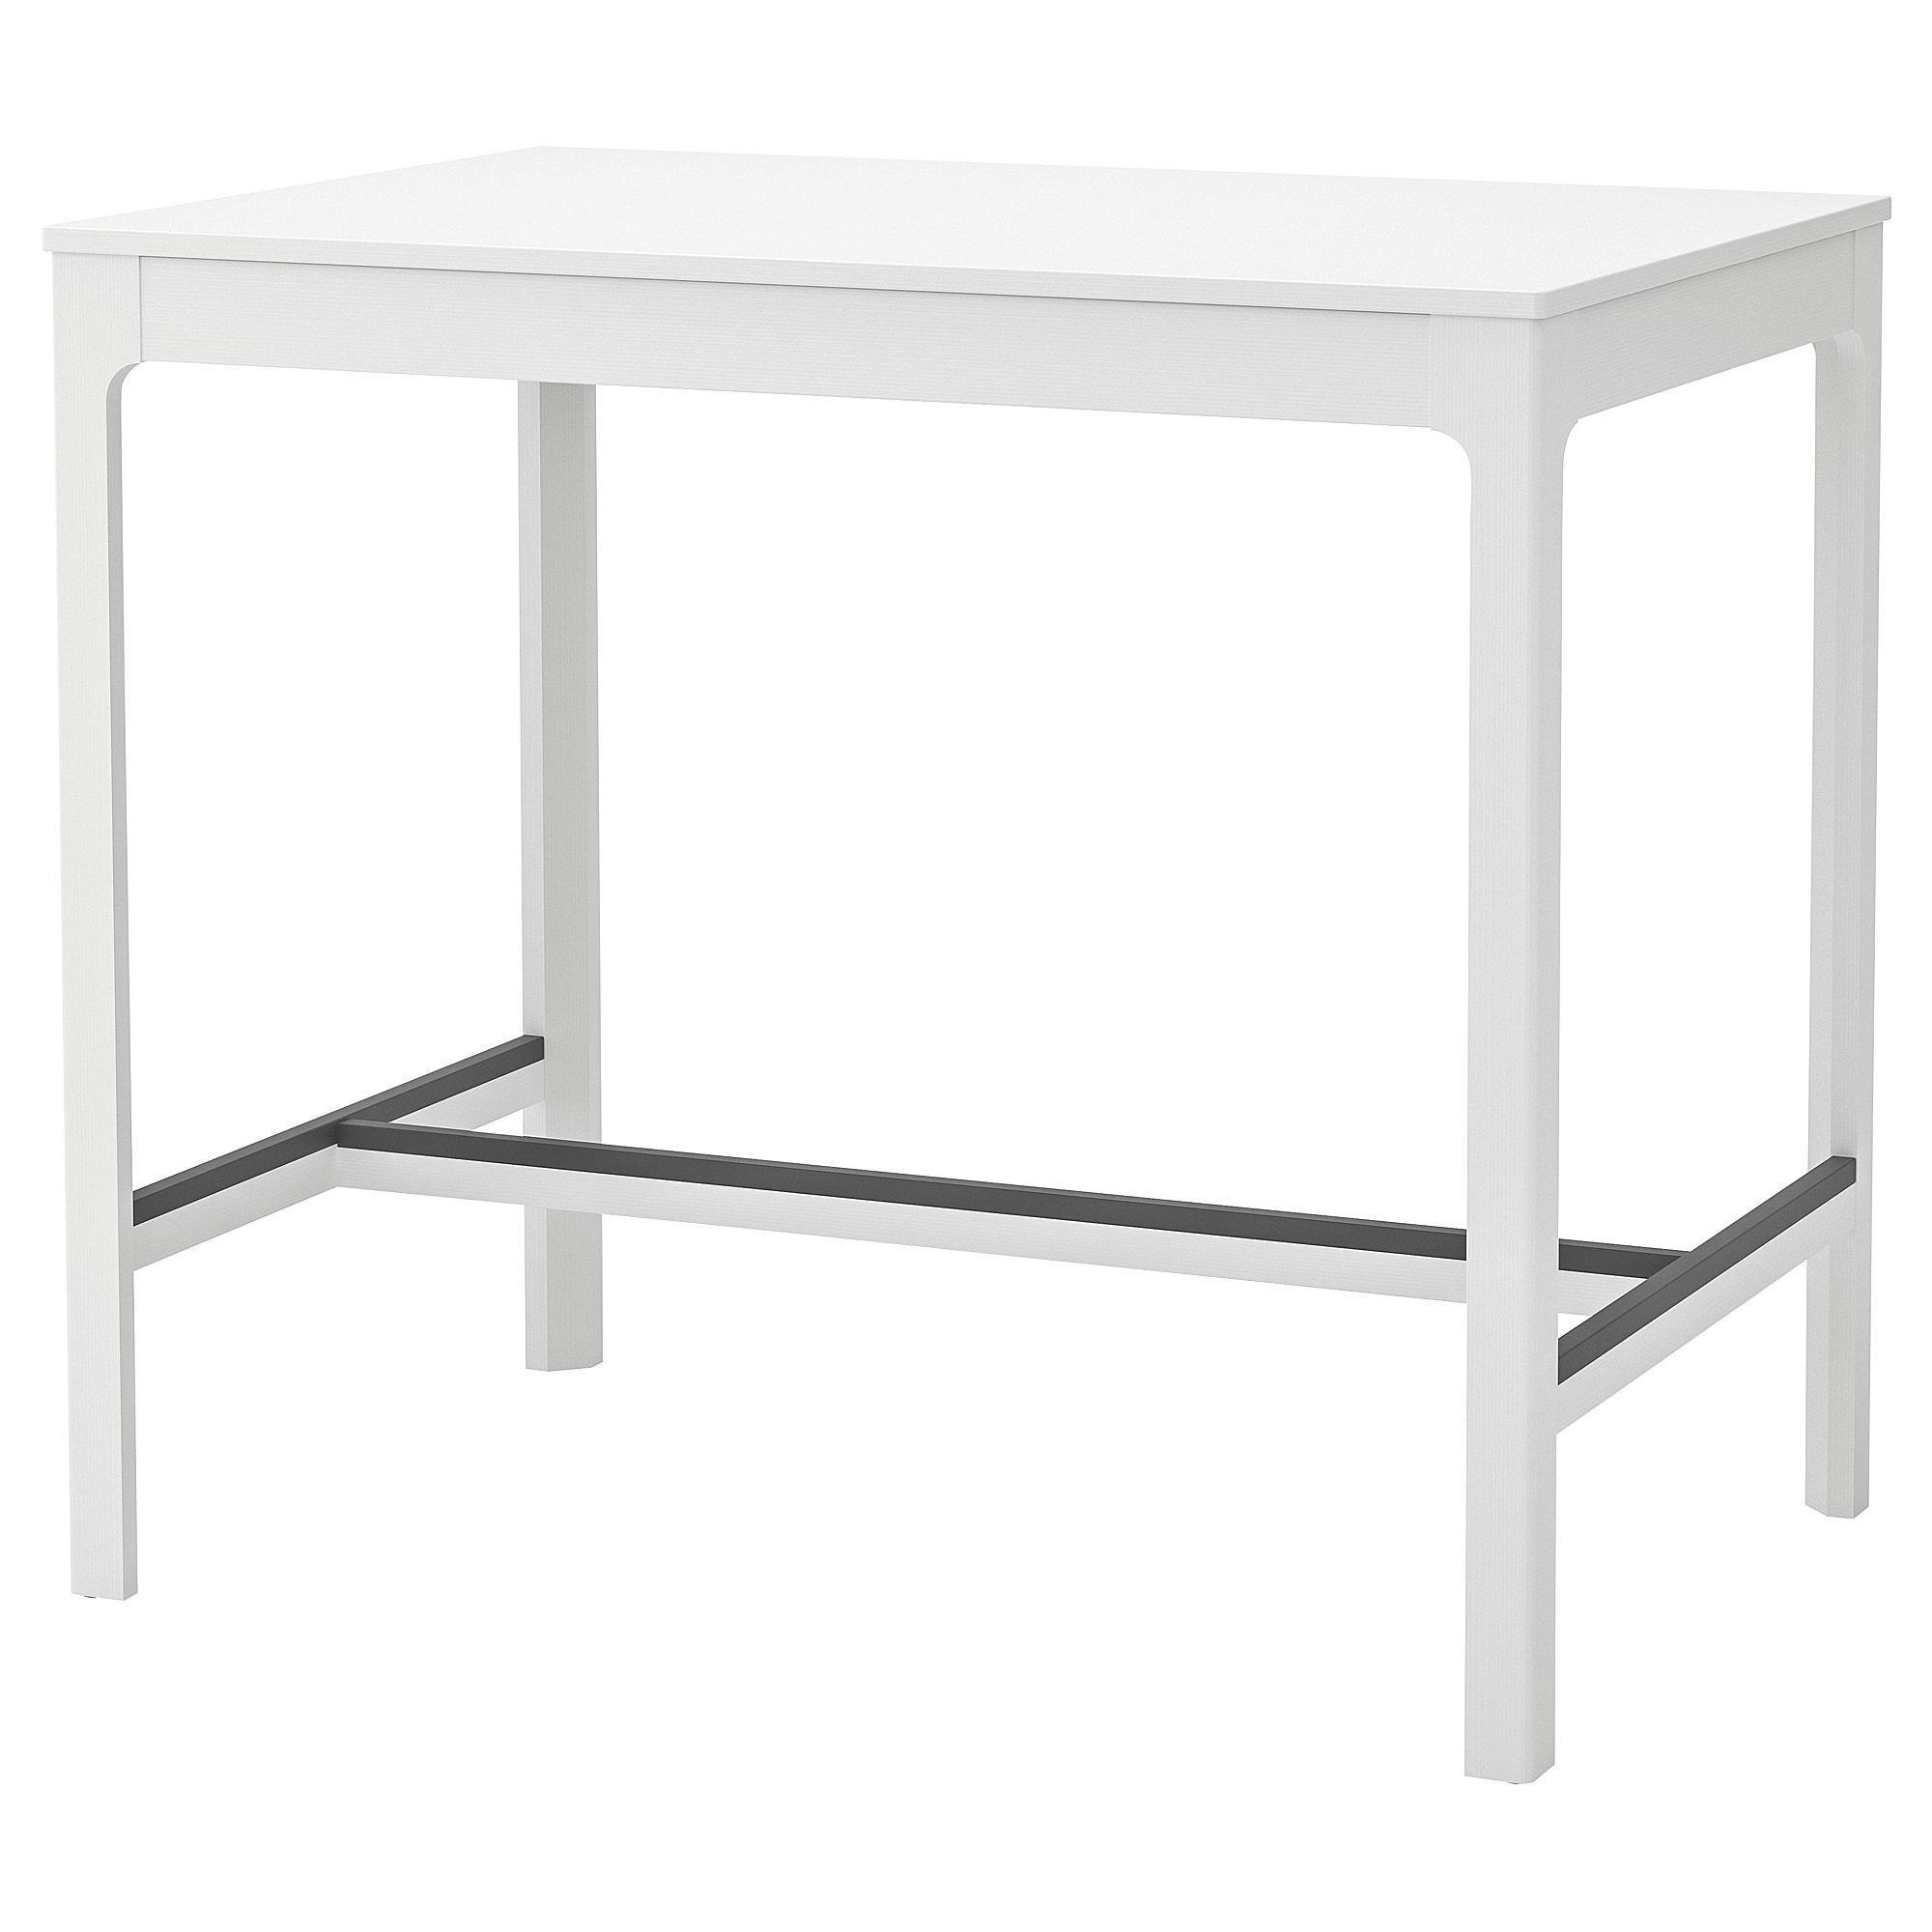 Ekedalen Bar Table White 47 1 4x31 1 2 Bar Table Ikea